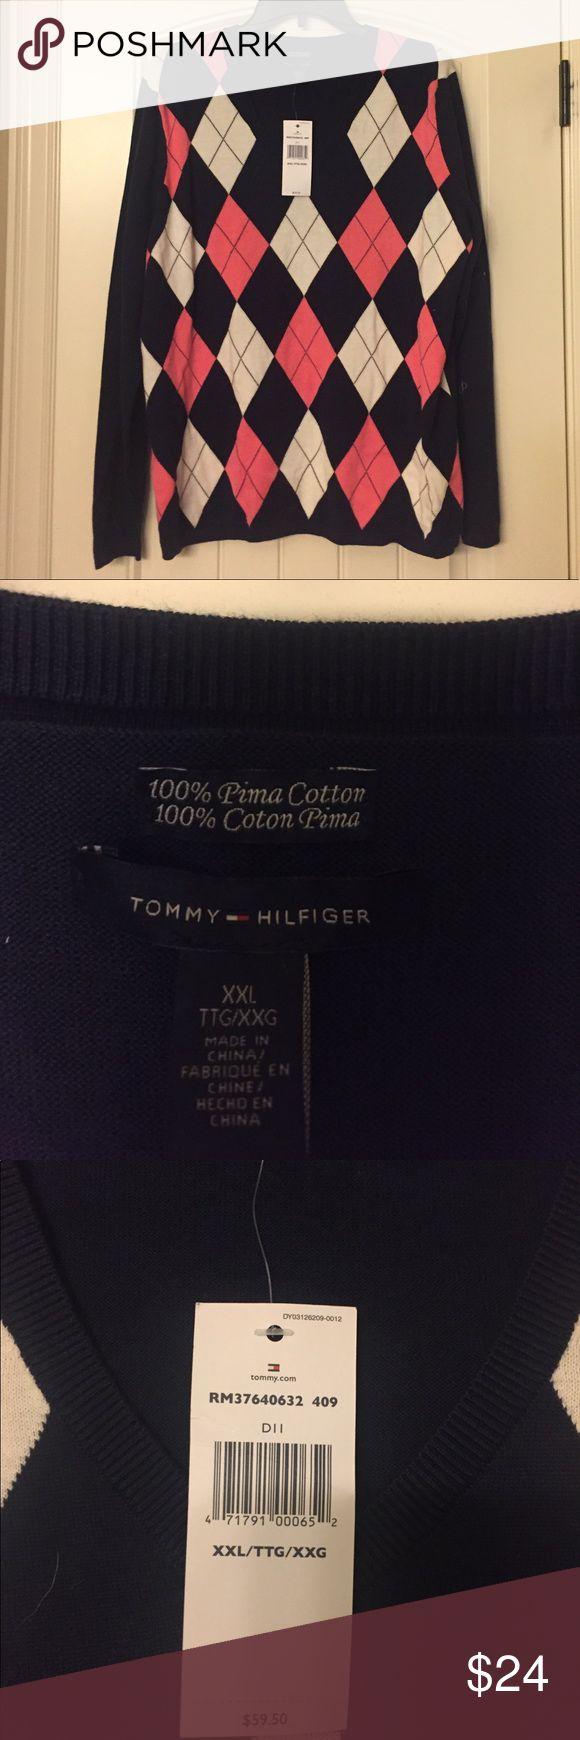 NWT Tommy Hilfiger v neck Argyle sweater NWT Tommy Hilfiger v neck Argyle sweater Tommy Hilfiger Sweaters V-Necks